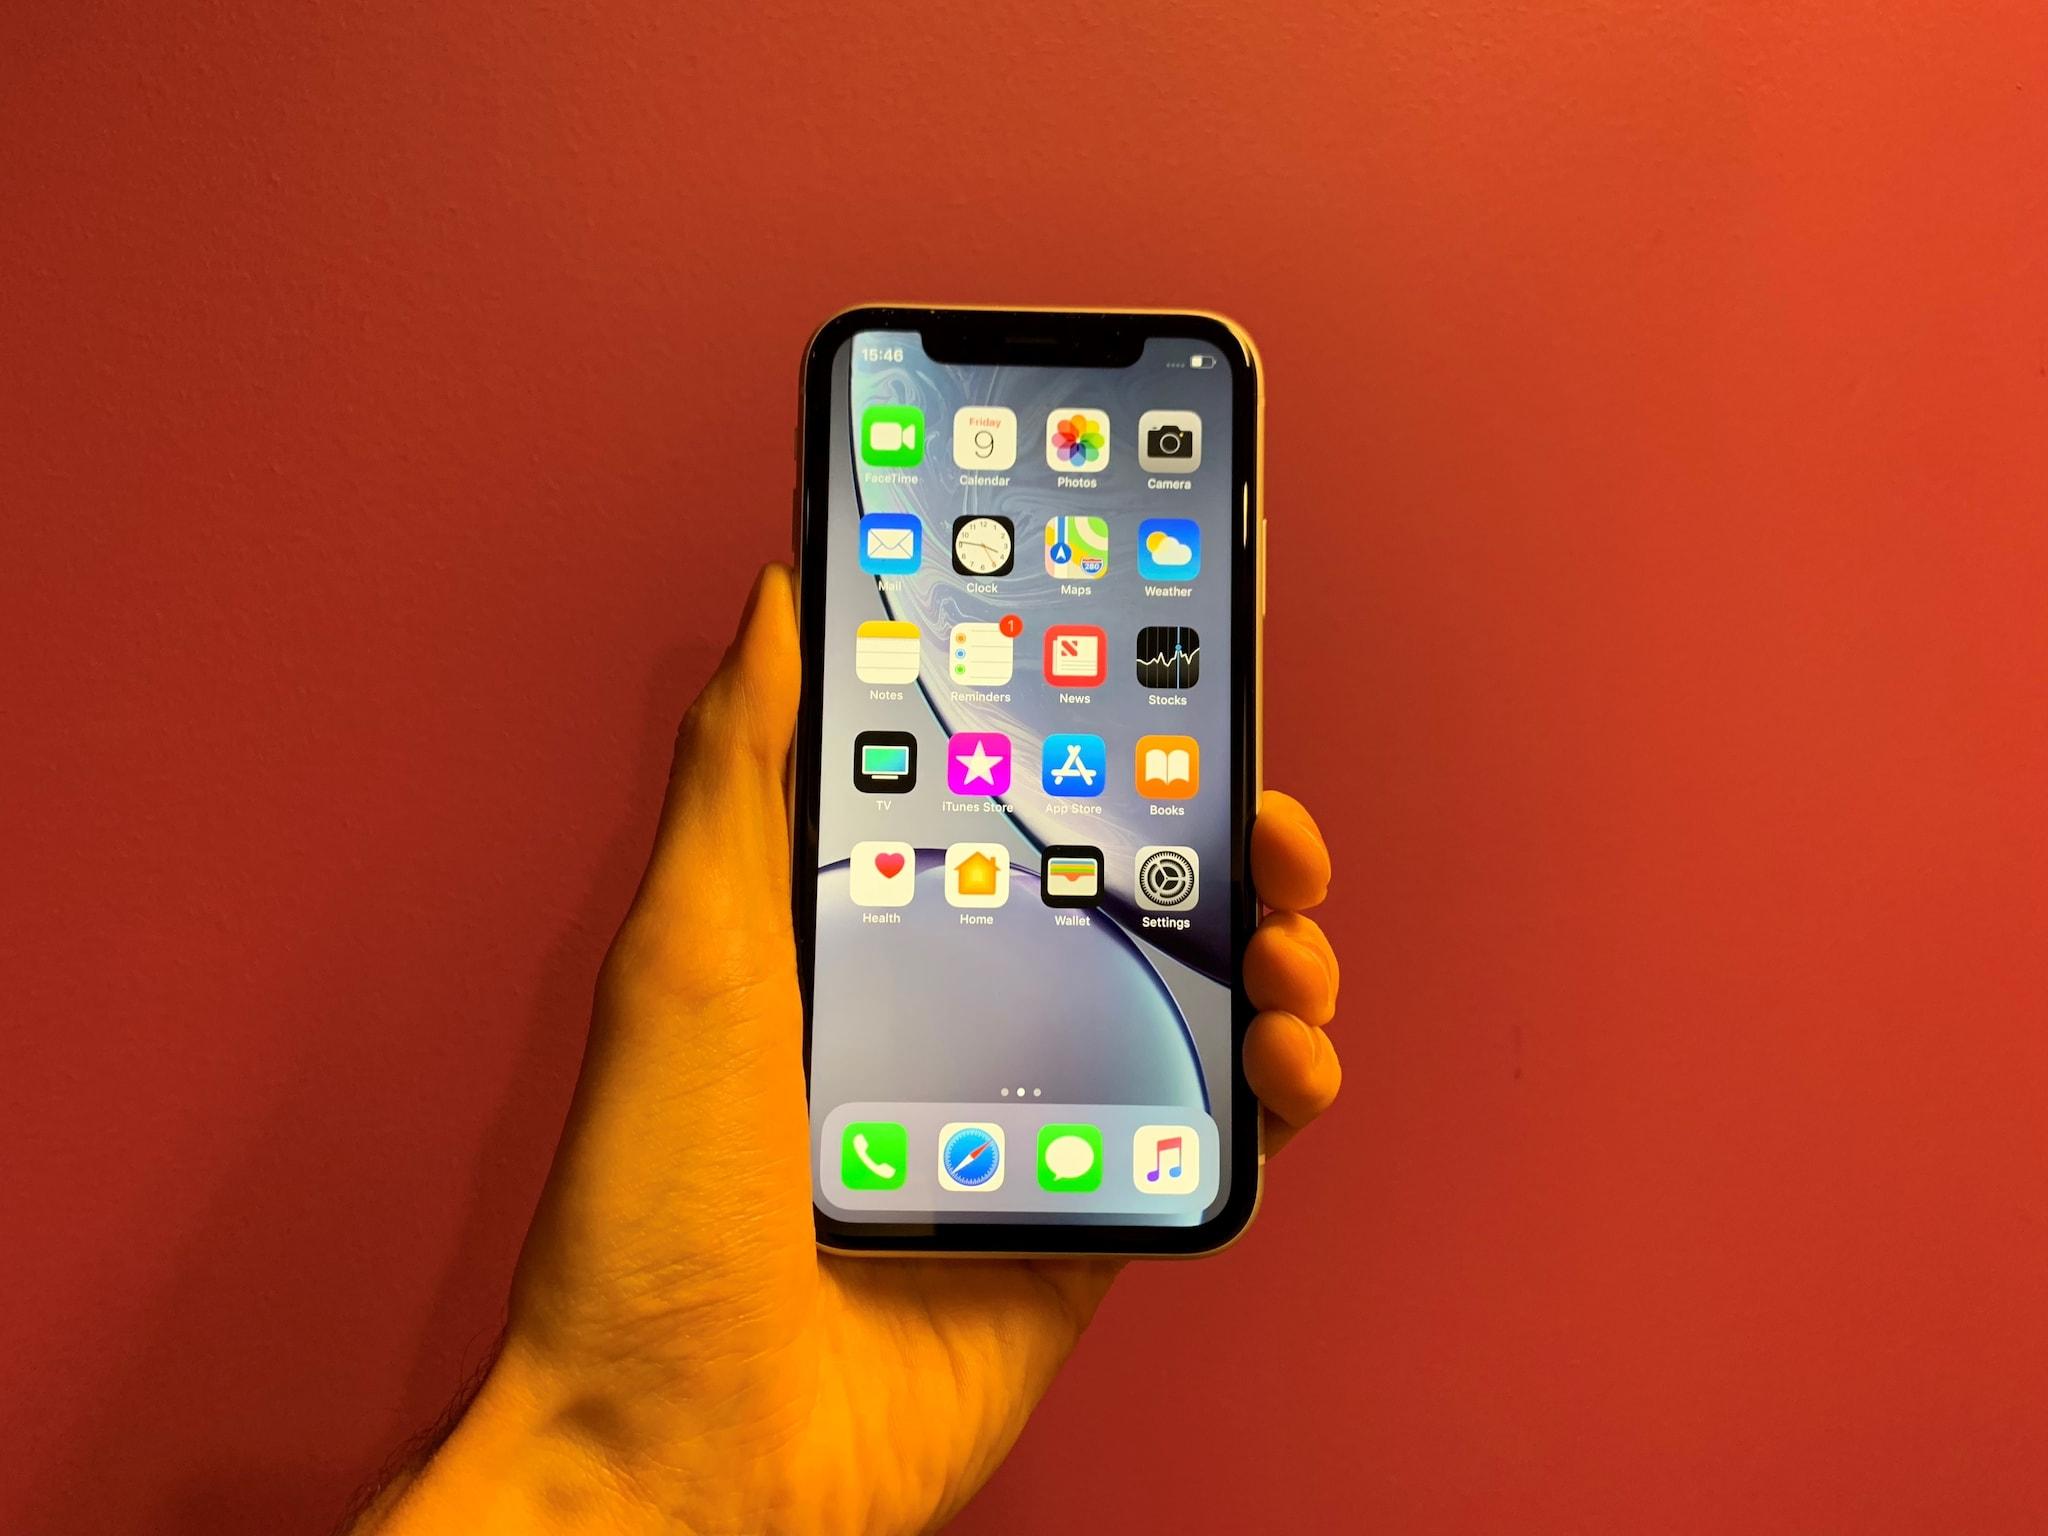 iPhone XR- તેના 128 જીબી વેરિએન્ટ 5000 રૂપિયાના ડિસ્કાઉન્ટ પર ખરીદી શકો છો. આ ફોનની બજાર કિંમત 49,900 રૂપિયા છે, પરંતુ જો તમે એચડીએફસી ક્રેડિટ / ડેબિટ કાર્ડથી ચુકવણી કરો છો, તો તમને ફ્લેટ 5 હજાર રૂપિયાની છૂટ મળશે.